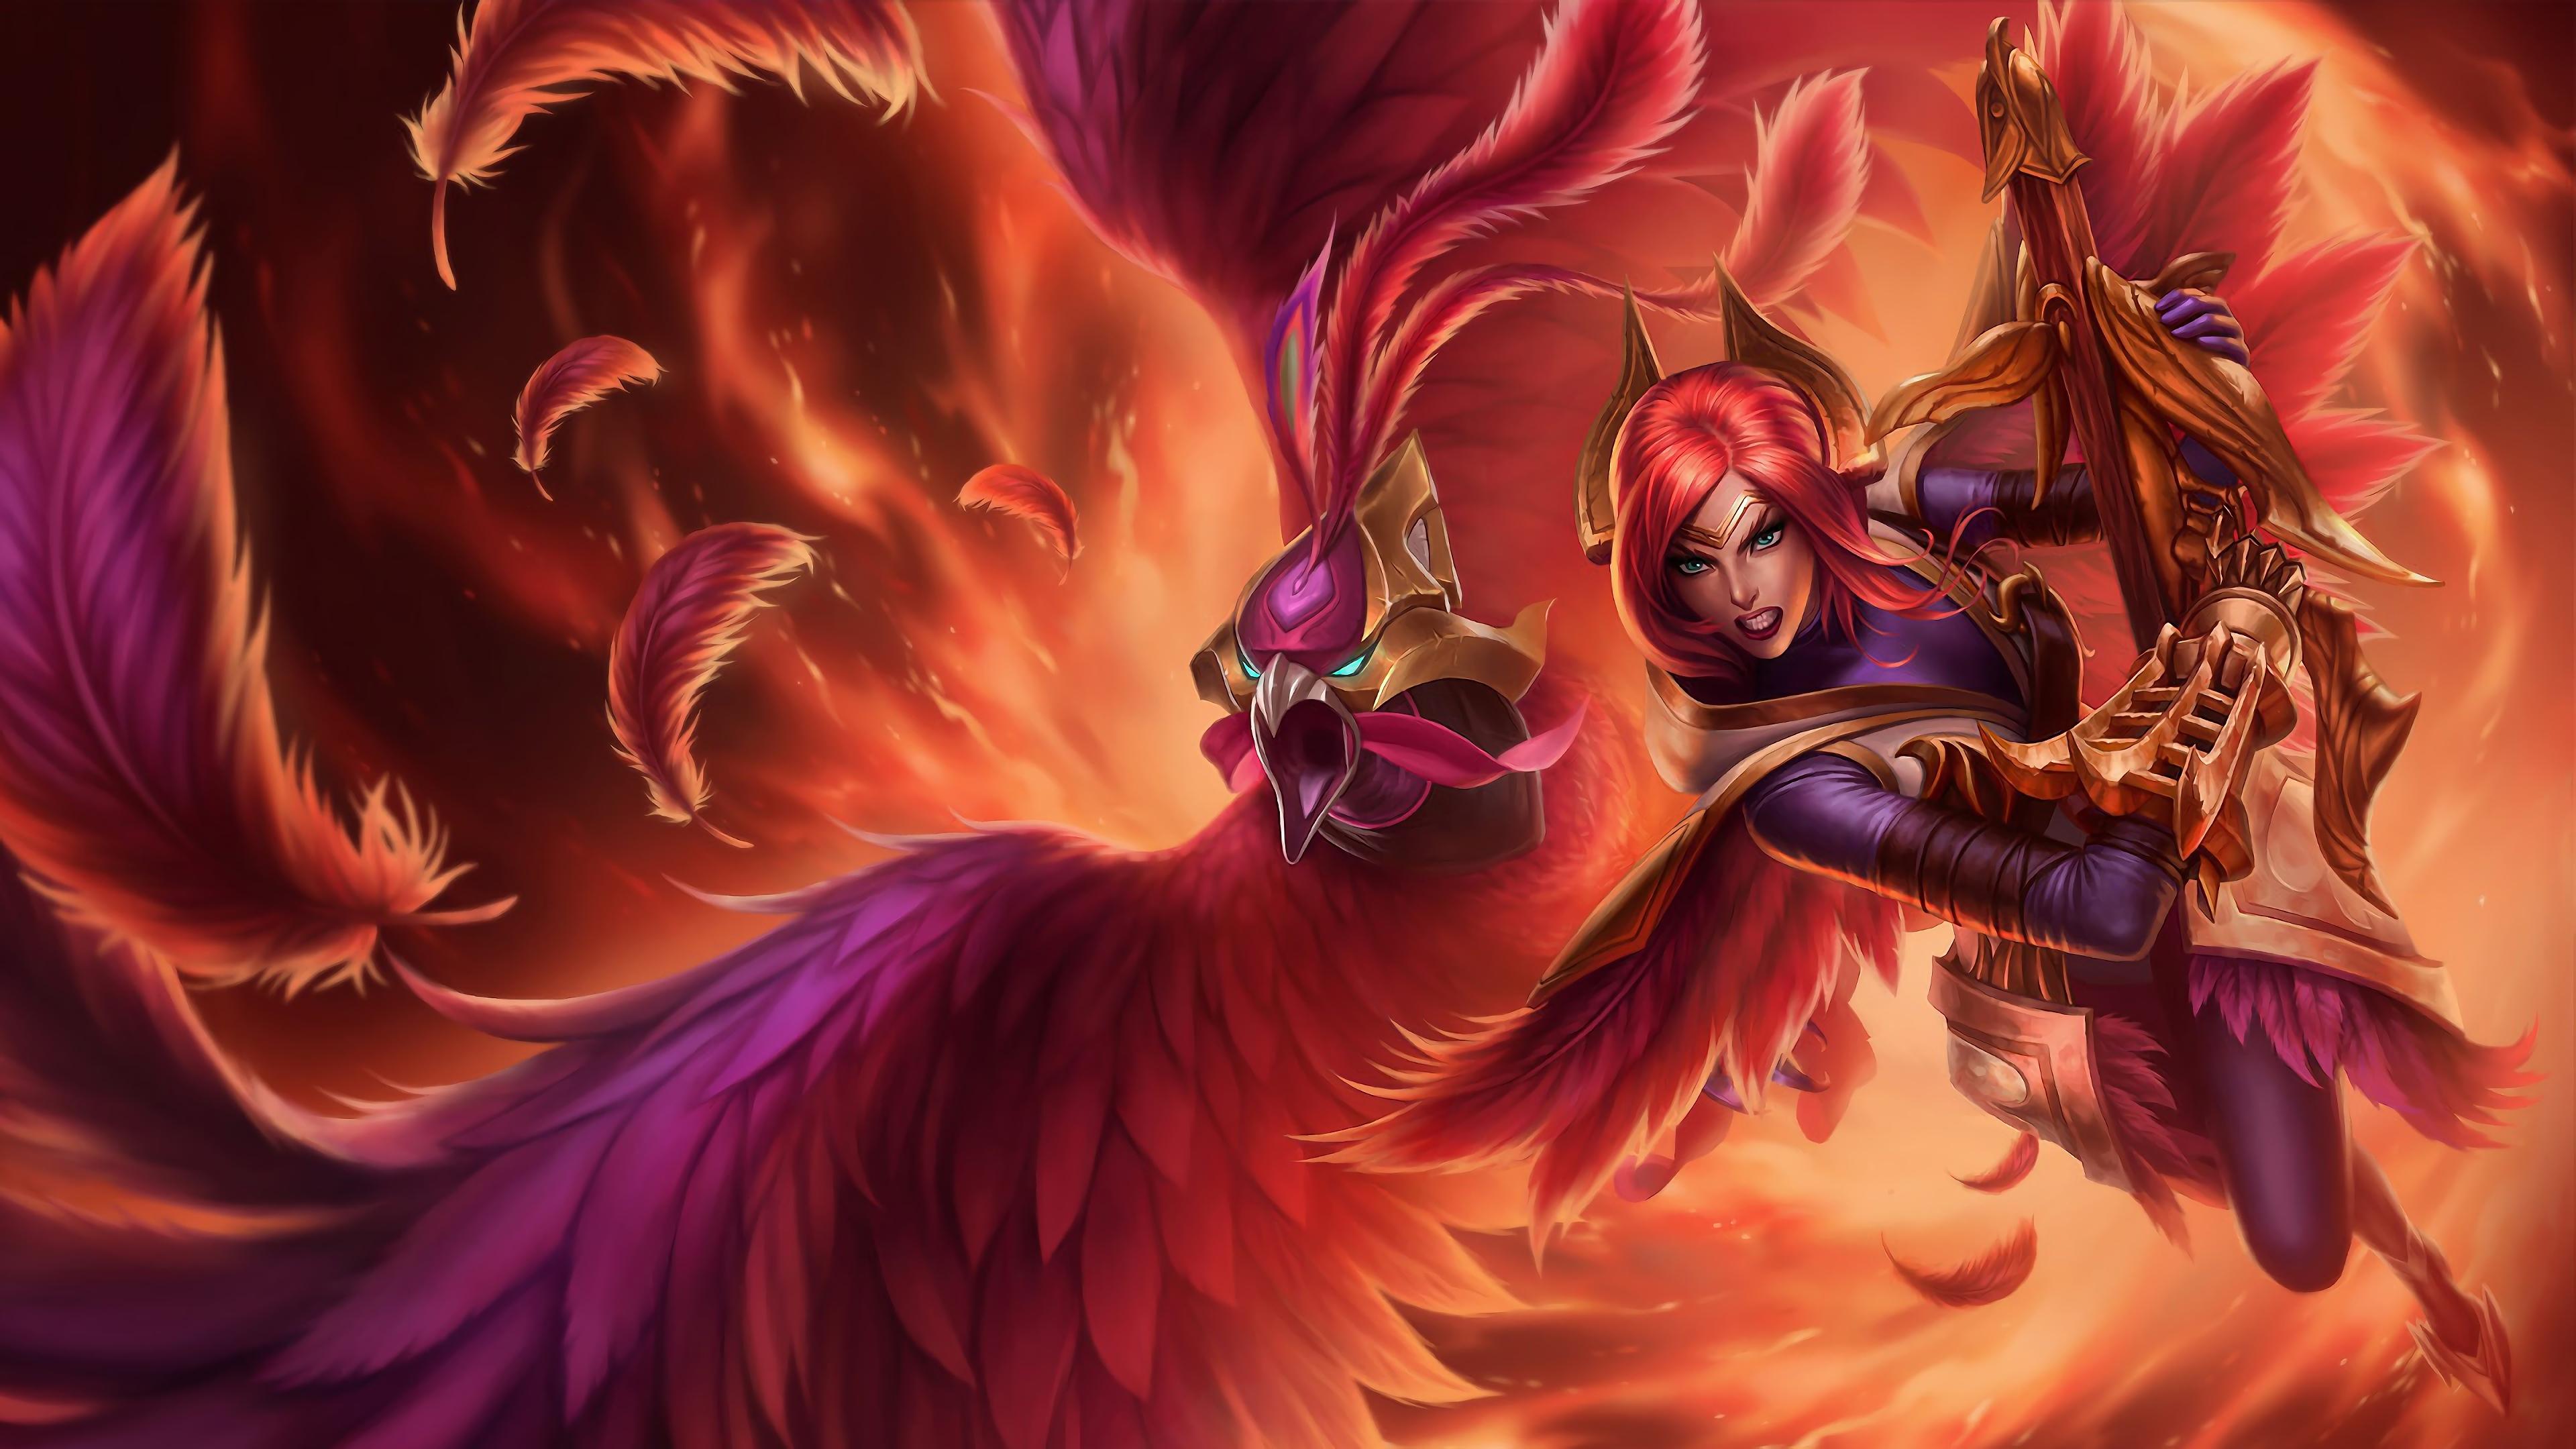 phoenix quinn lol splash art league of legends 1574098601 - Phoenix Quinn LoL Splash Art League of Legends - Quinn, league of legends